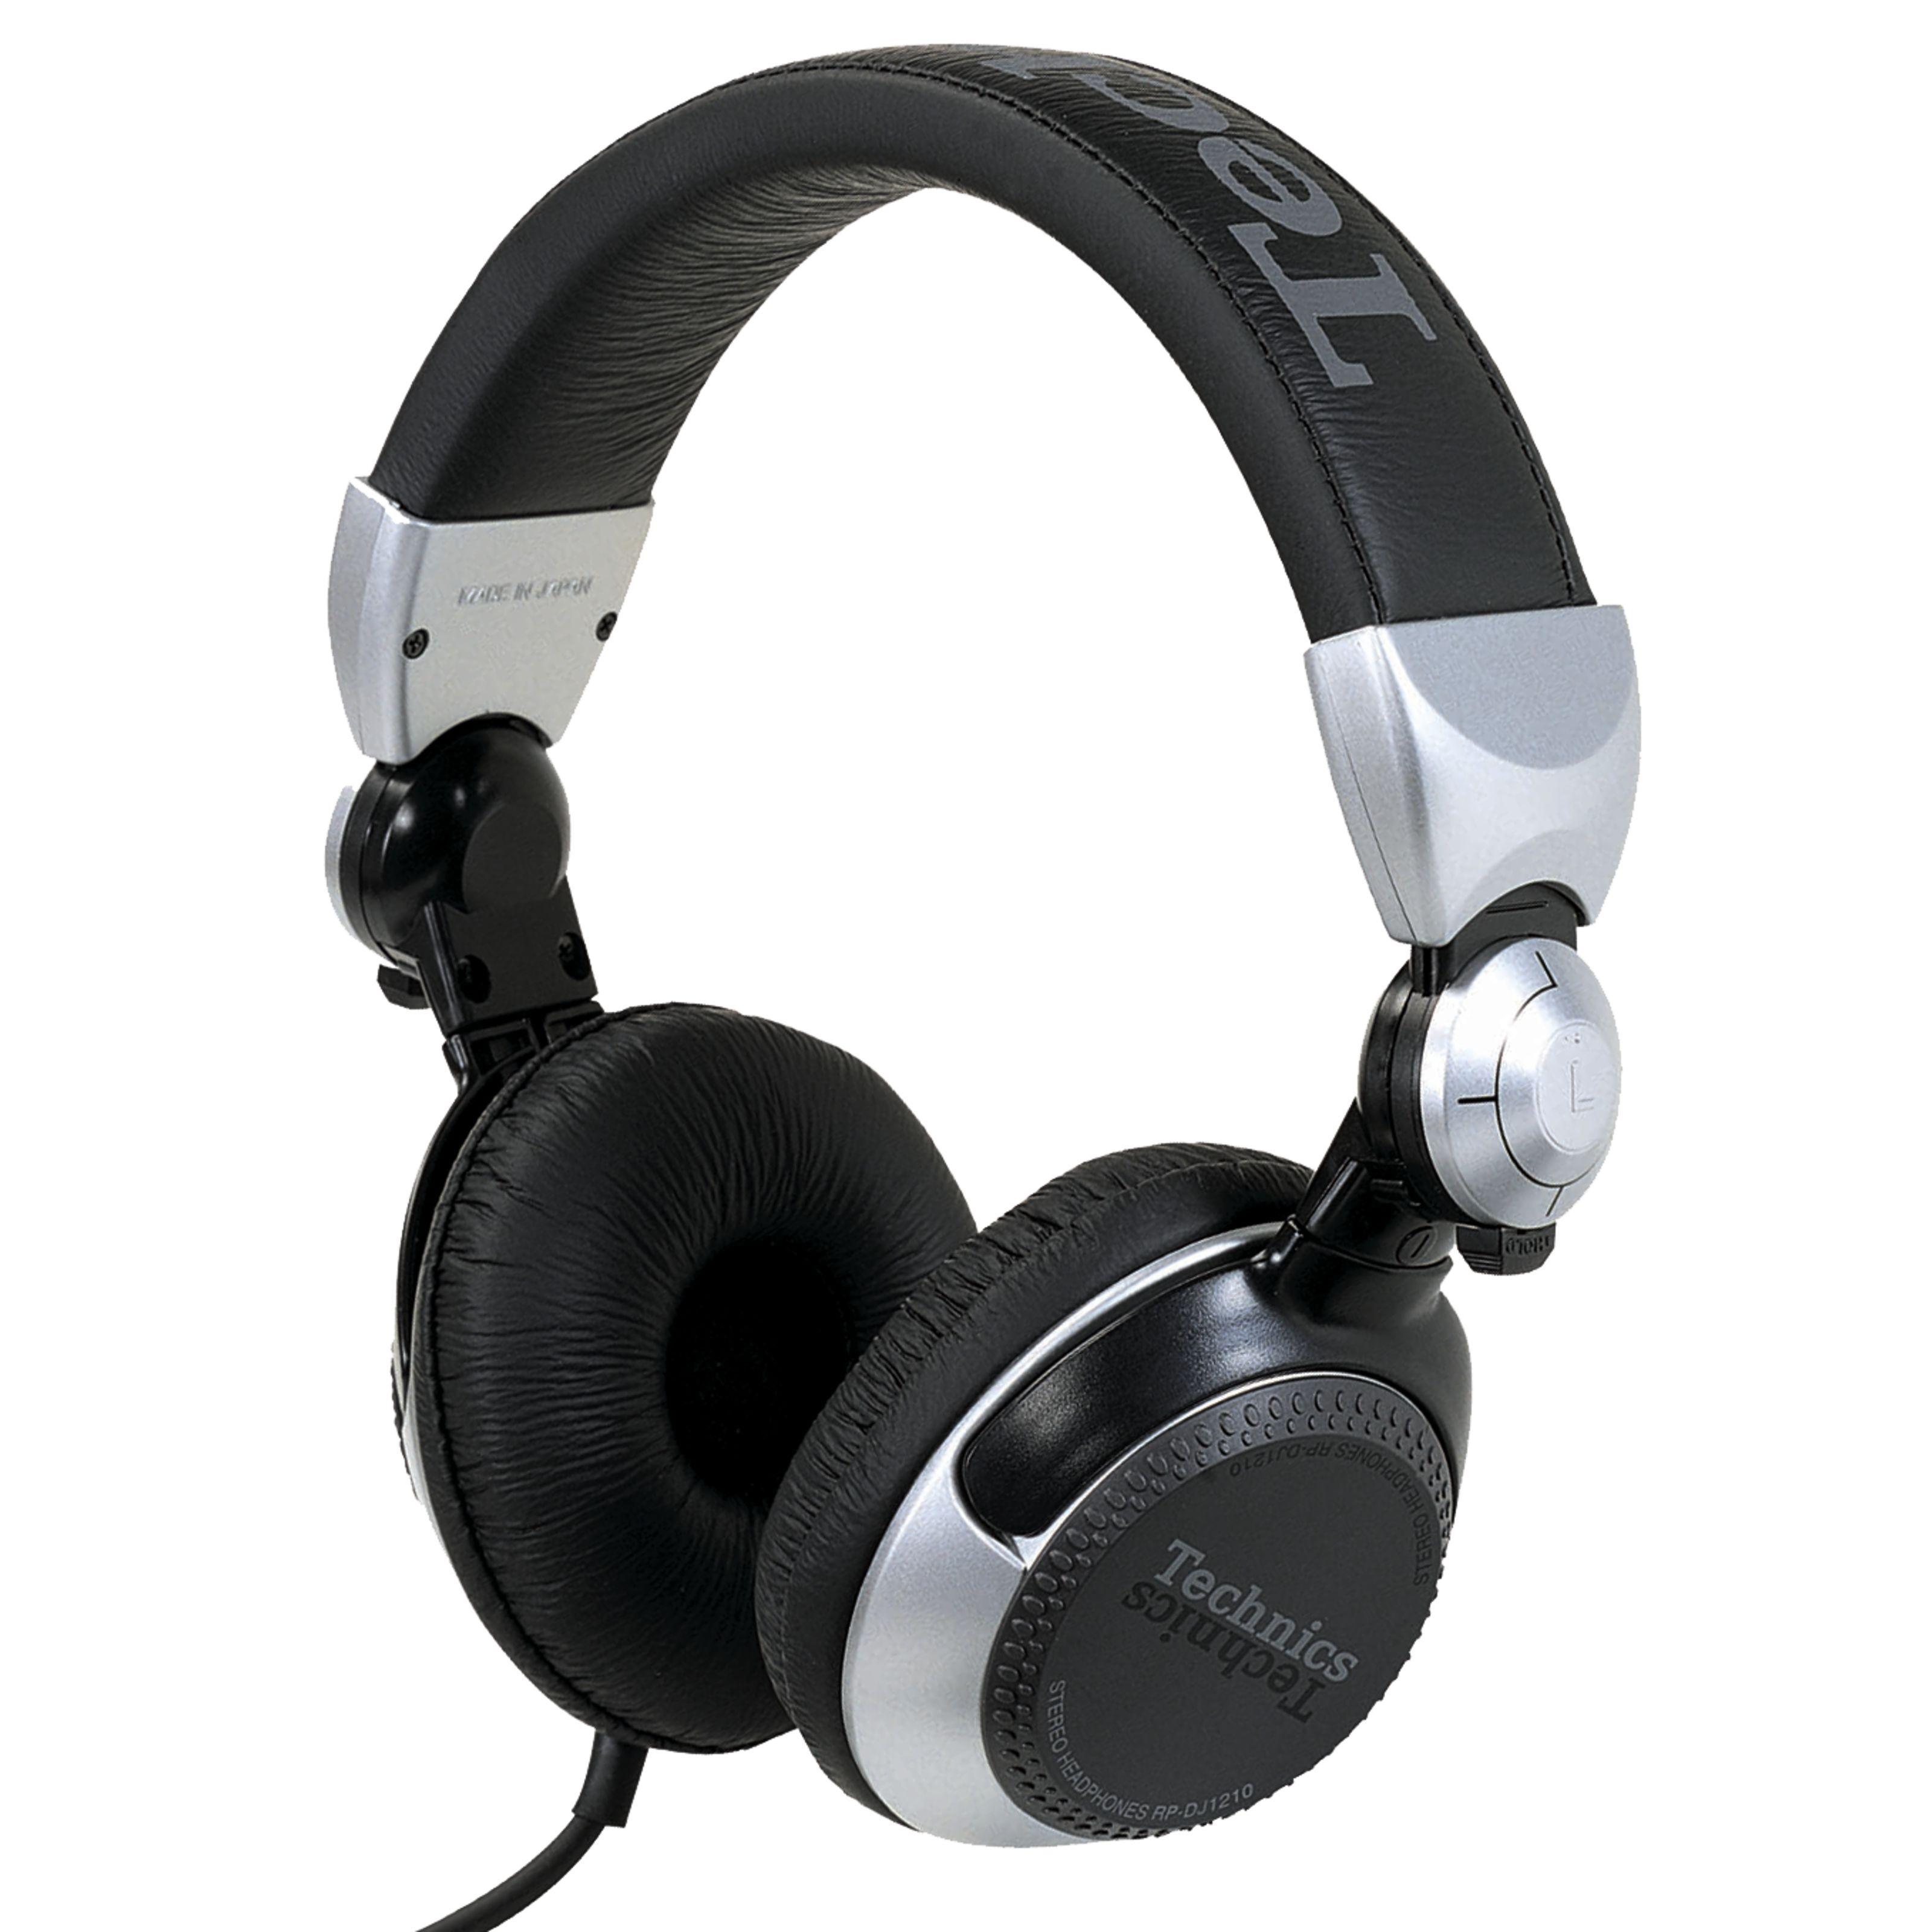 Technics RP-DJ1210E-S plateado 5 Hz - 30 kHz, 32 Ohmios, 106 db